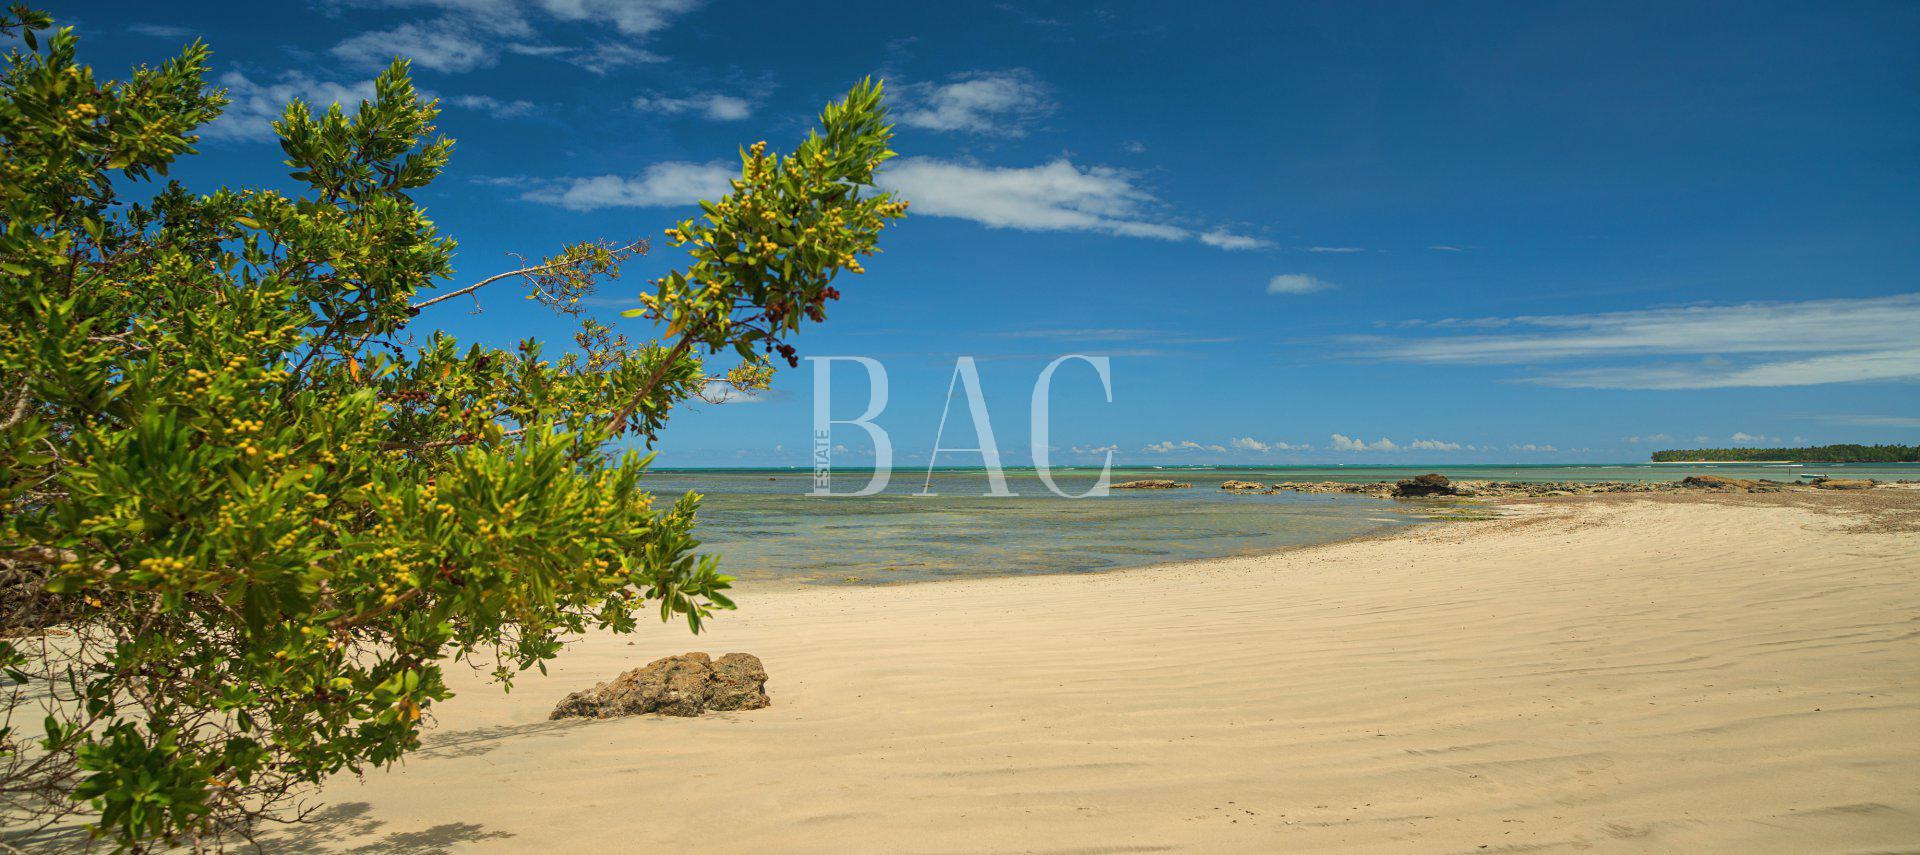 Property on Boipeba island in Brazil